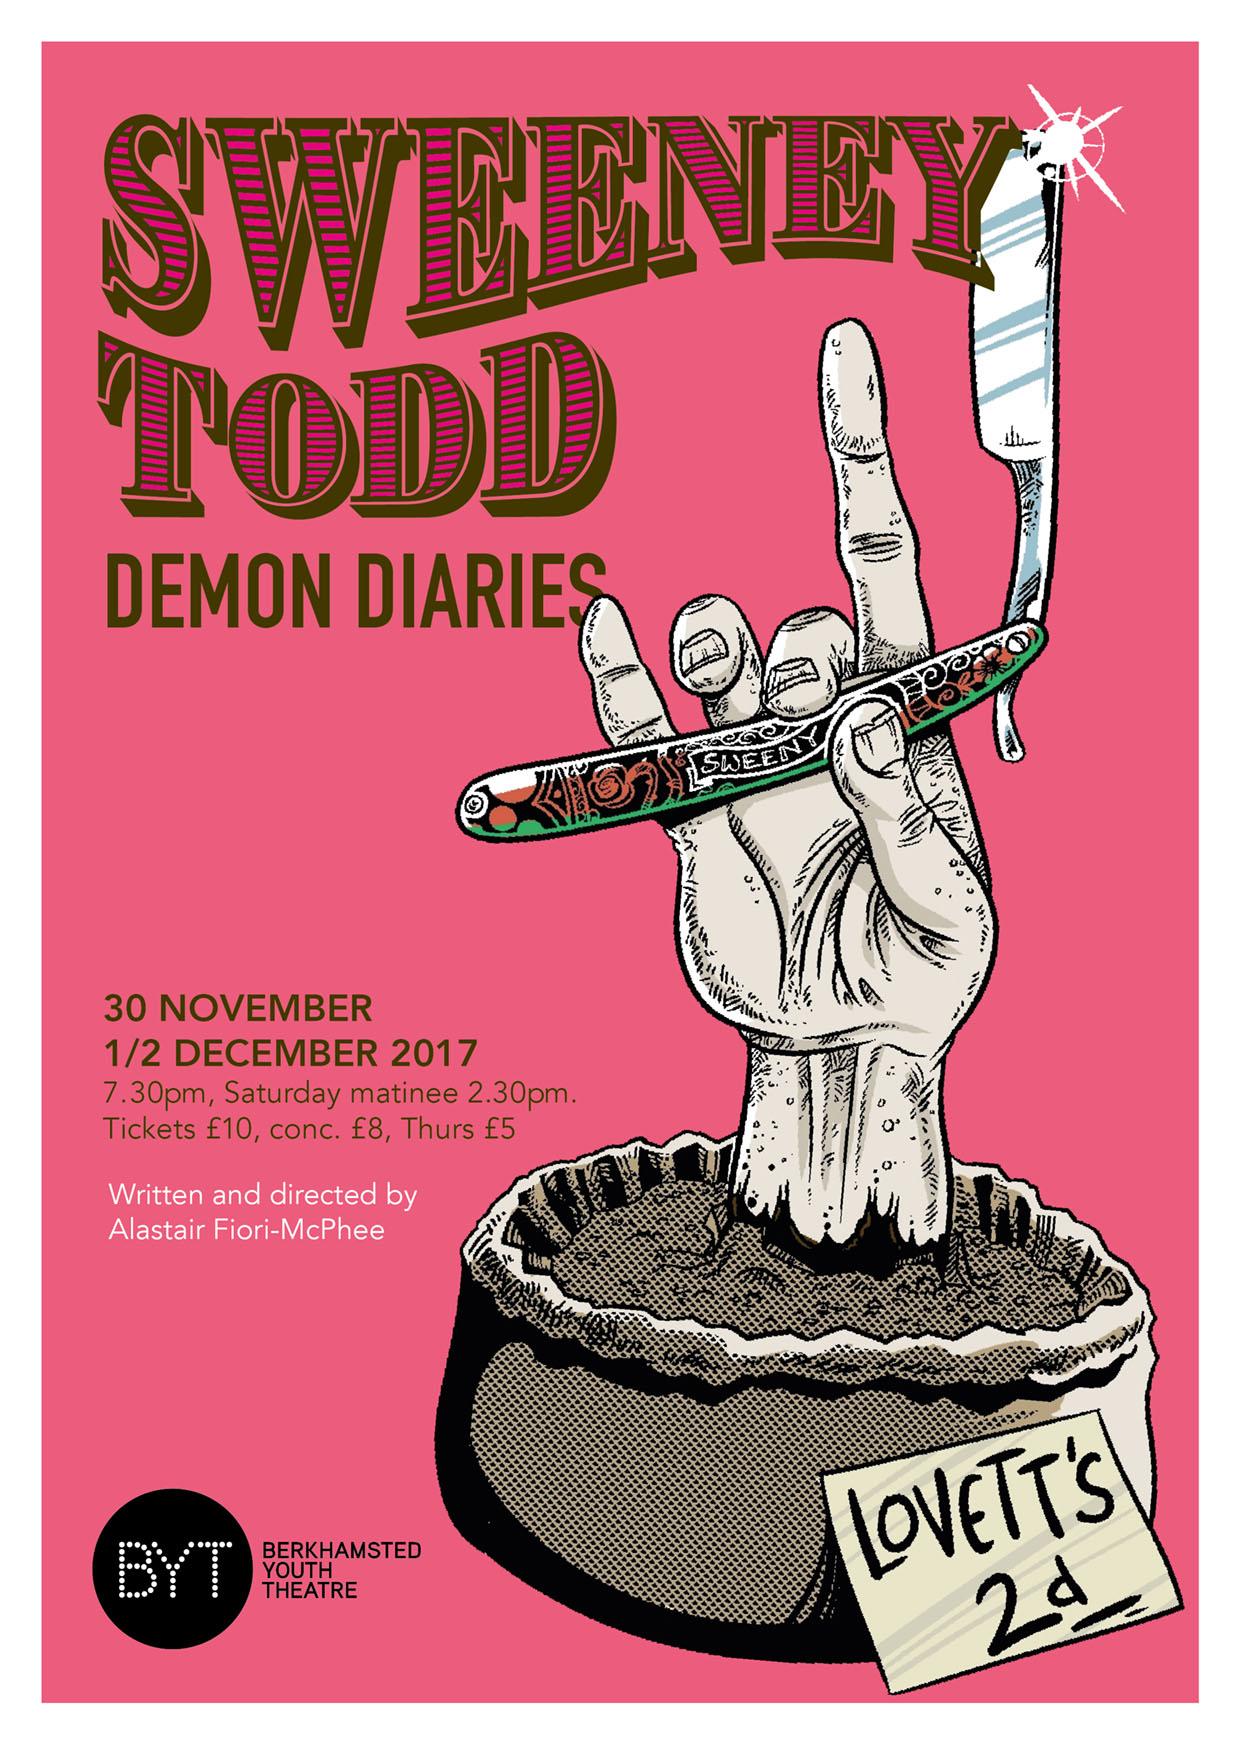 Sweeney Todd - November 2017